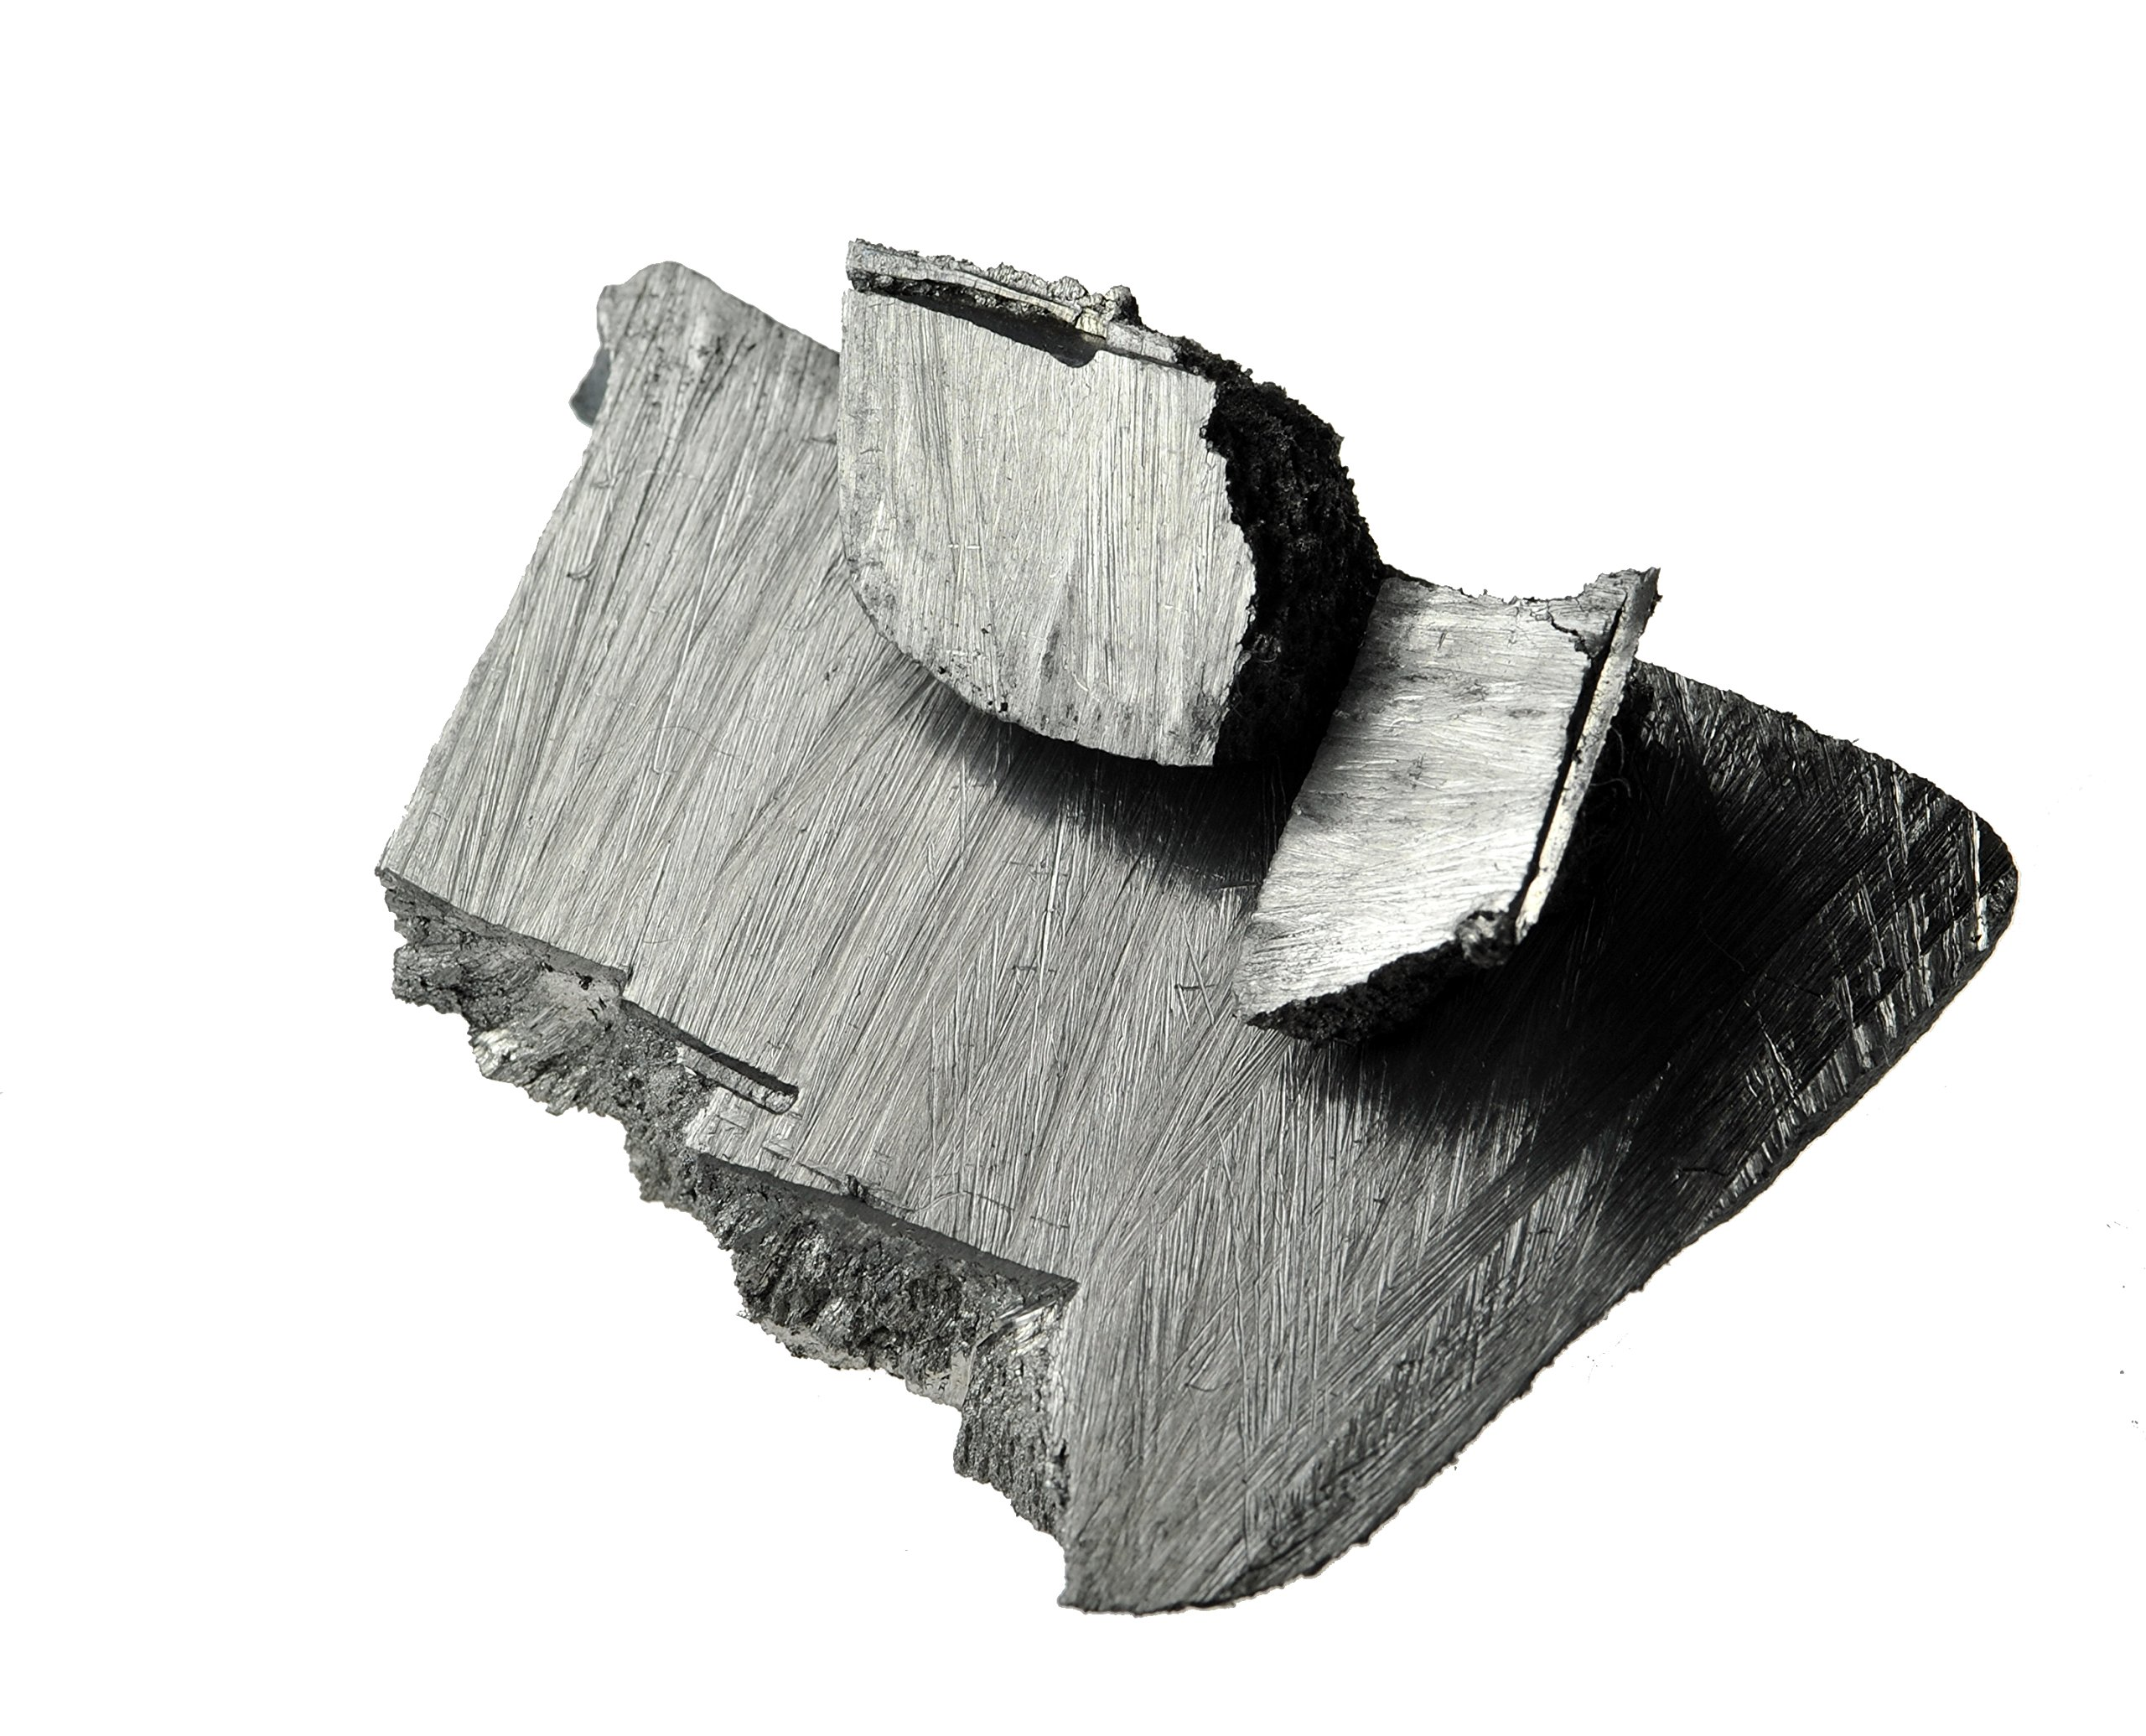 Praseodymium metal 99.6% 10g sample